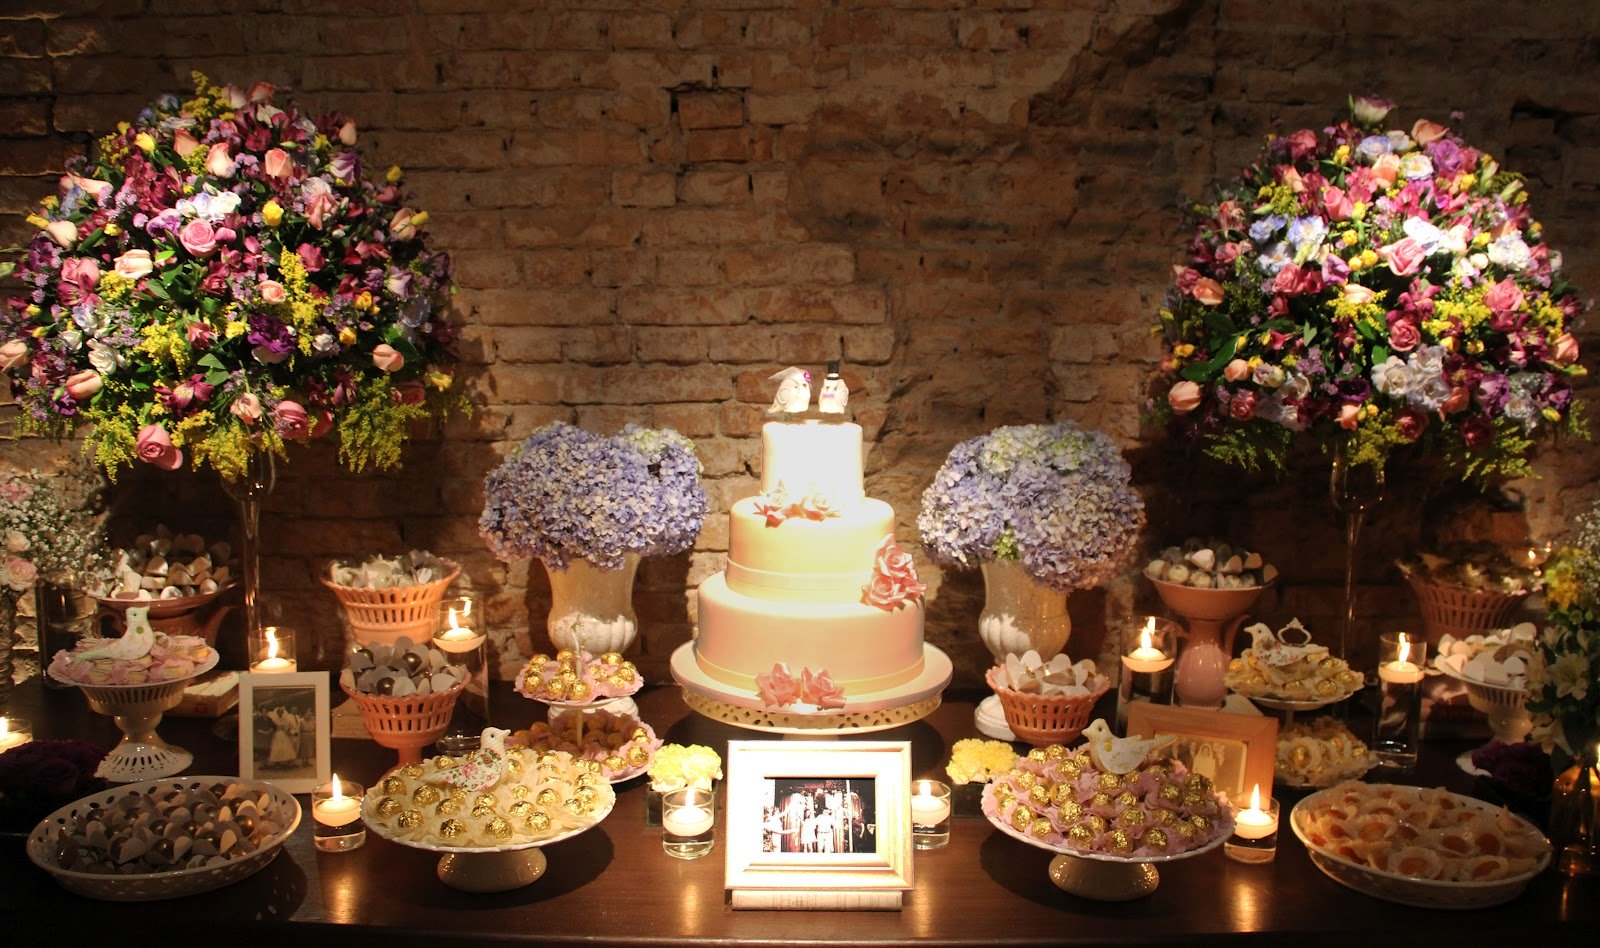 Como decorar a mesa de doces para casamento fast life fast life - Mesas de pared ...